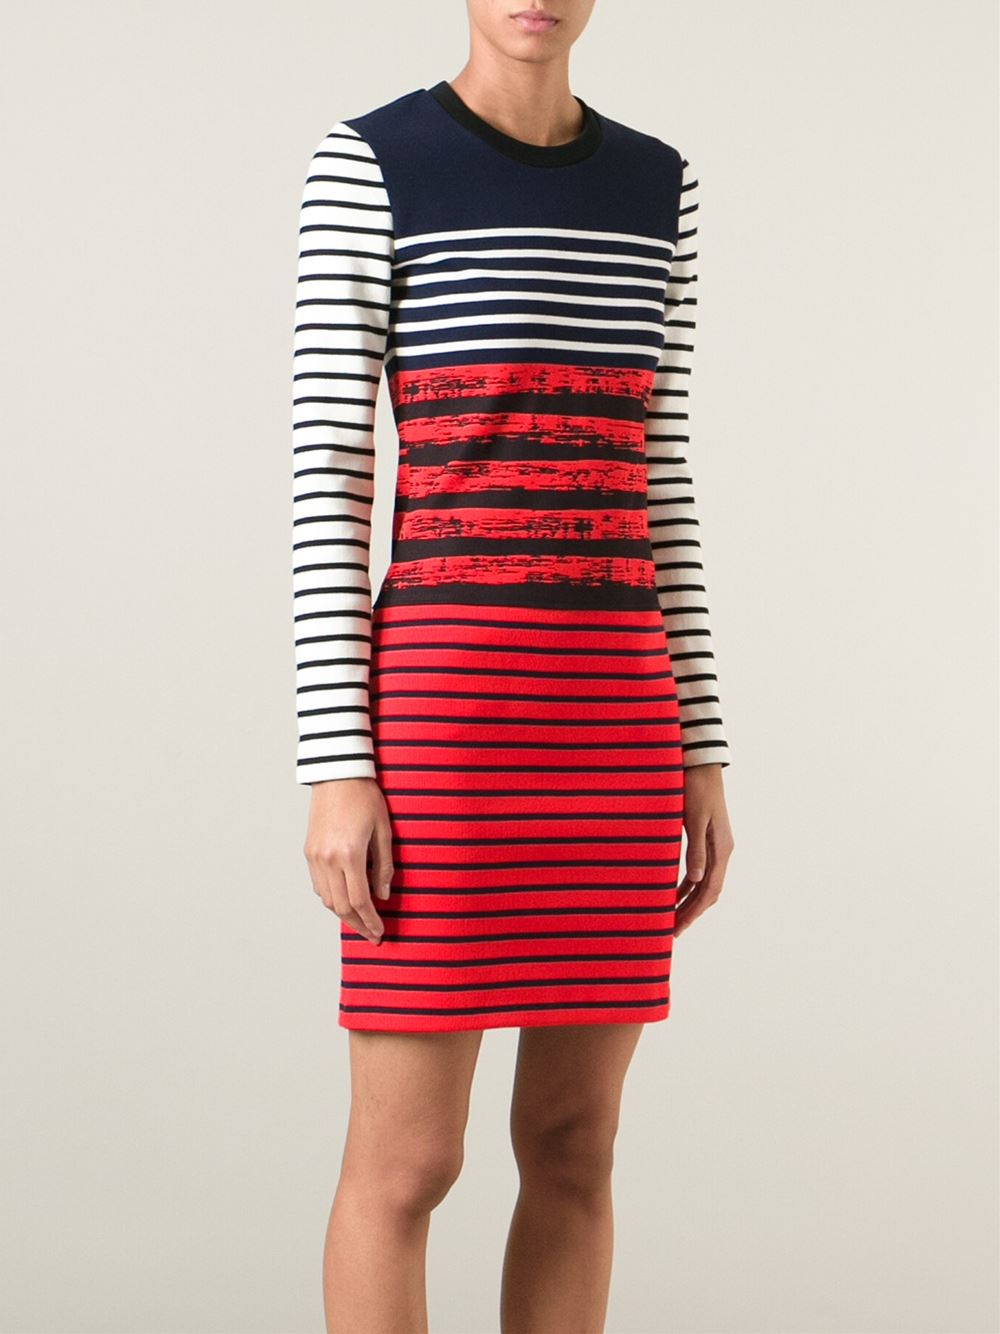 Petit bateau x cedric charlier mixed stripe dress in red for Petit bateau striped shirt